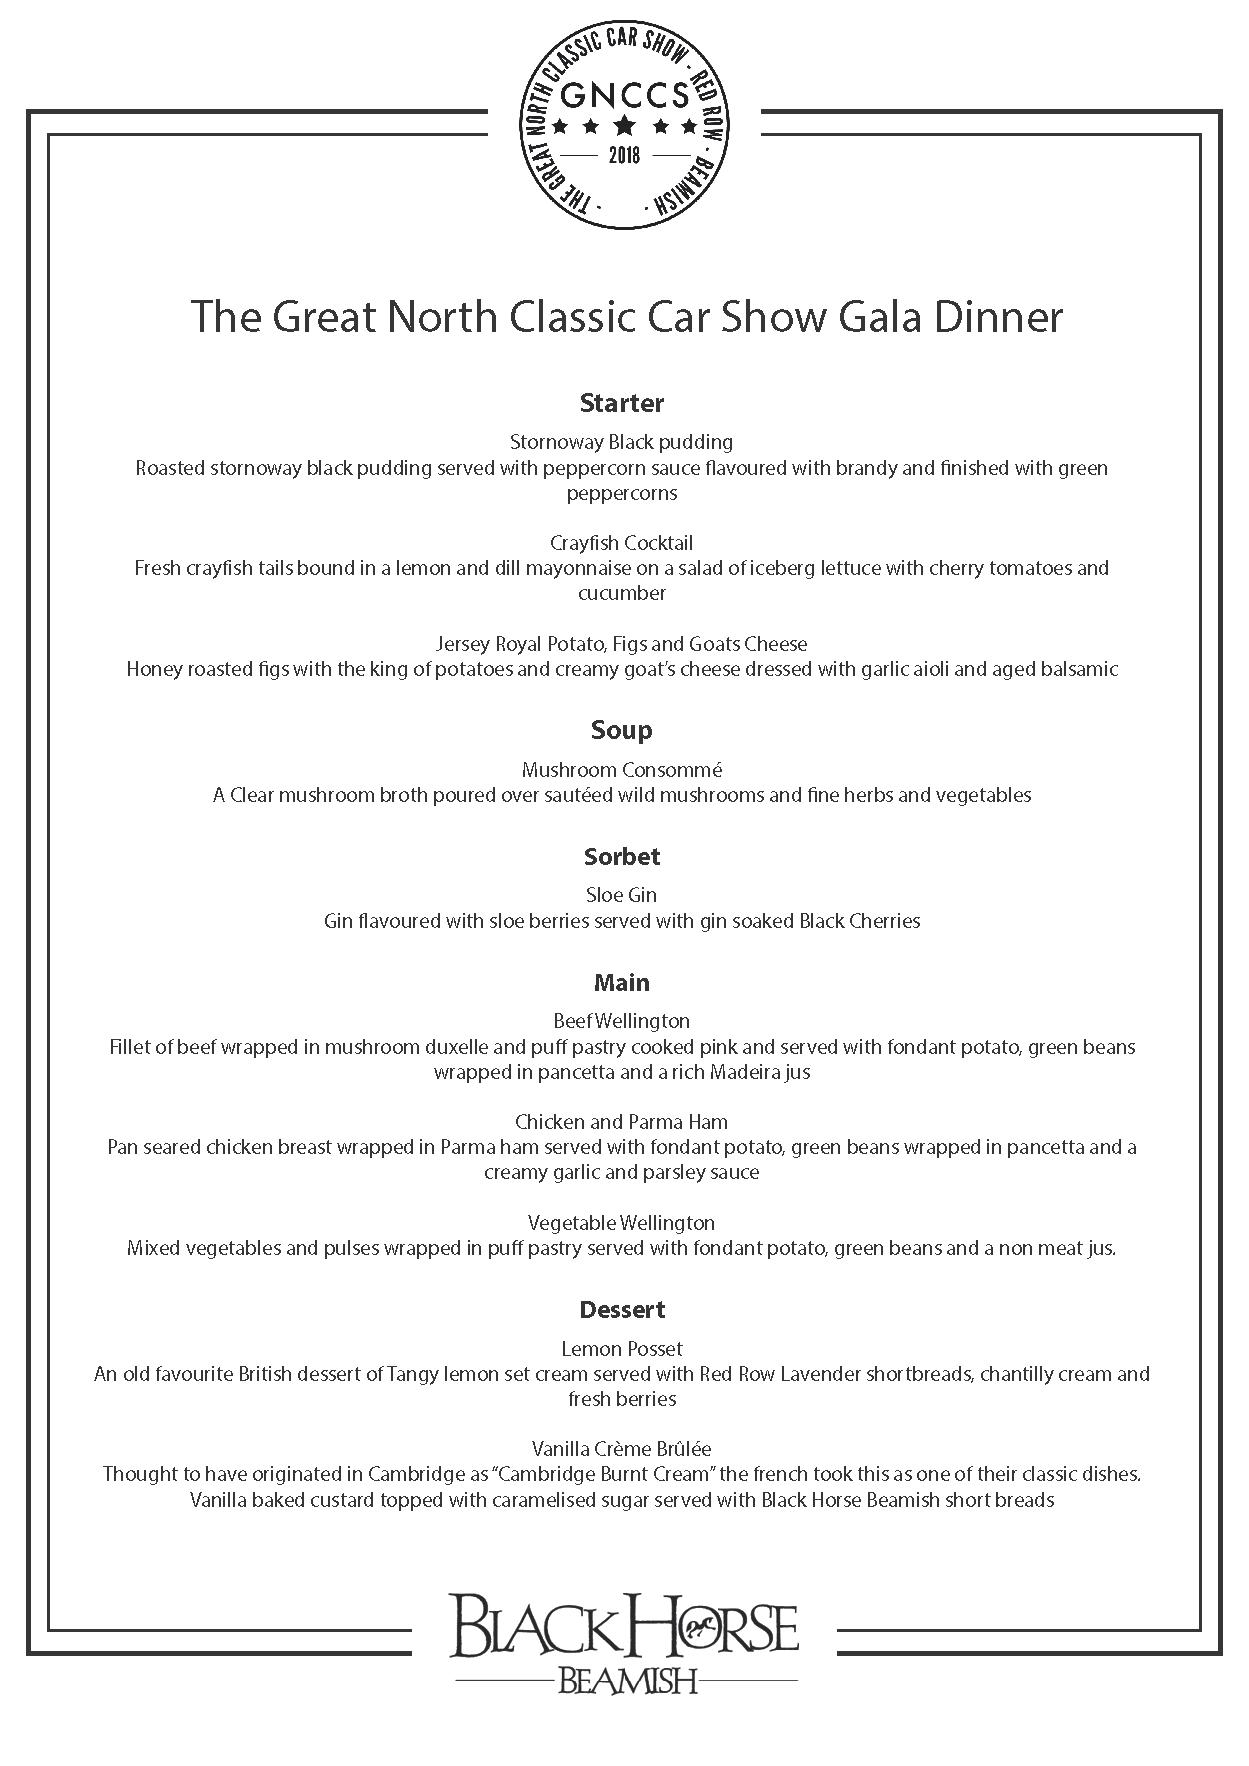 Great North Classic Car Show Gala Dinner Menu